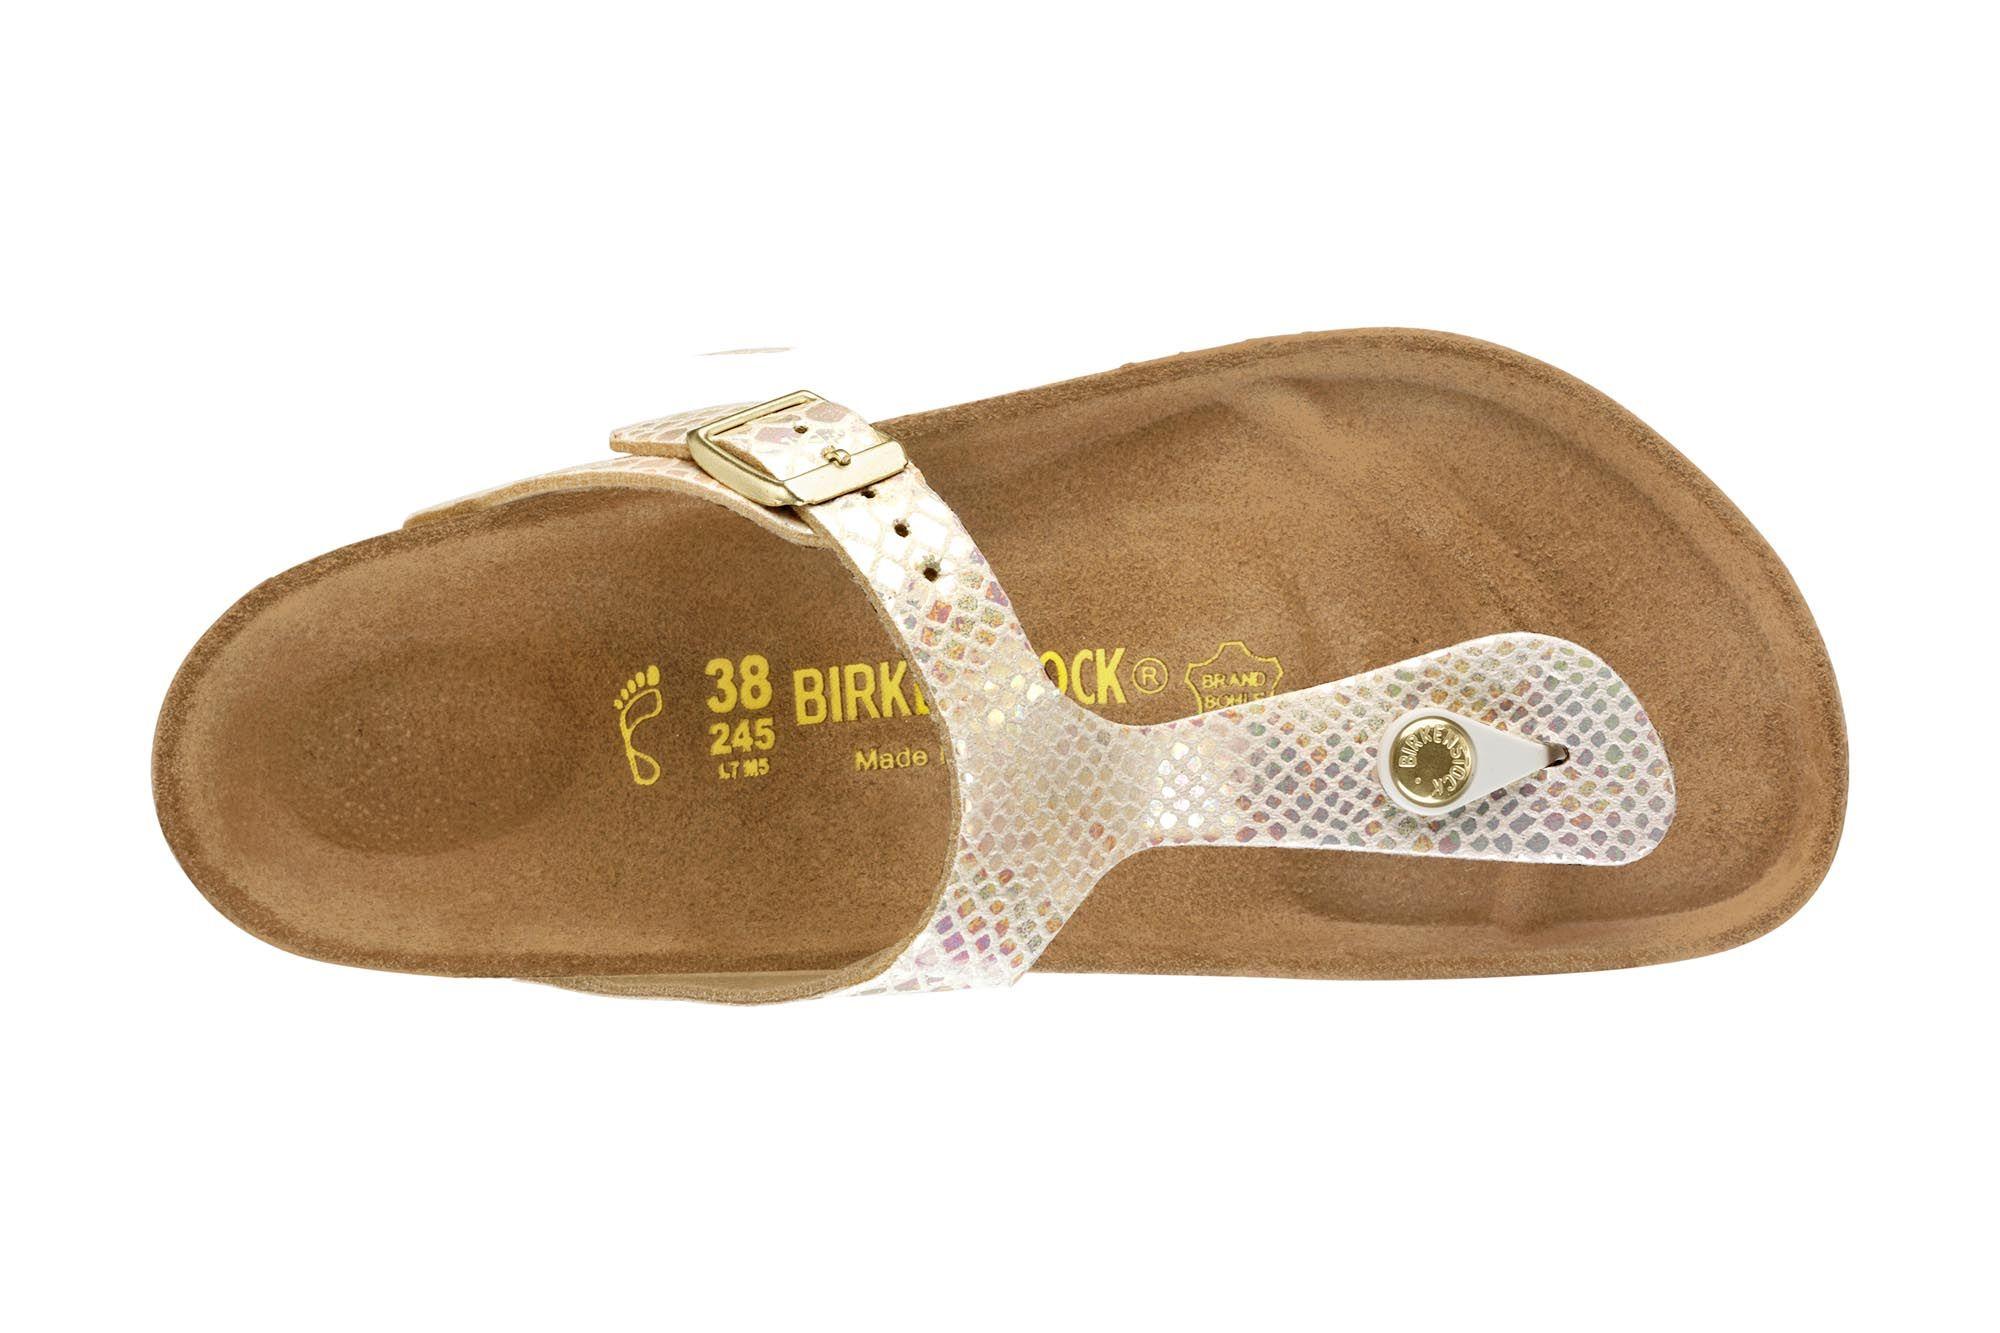 Gizeh Birko Flor Shiny Snake Cream | Schuhe, Birkenstock gizeh